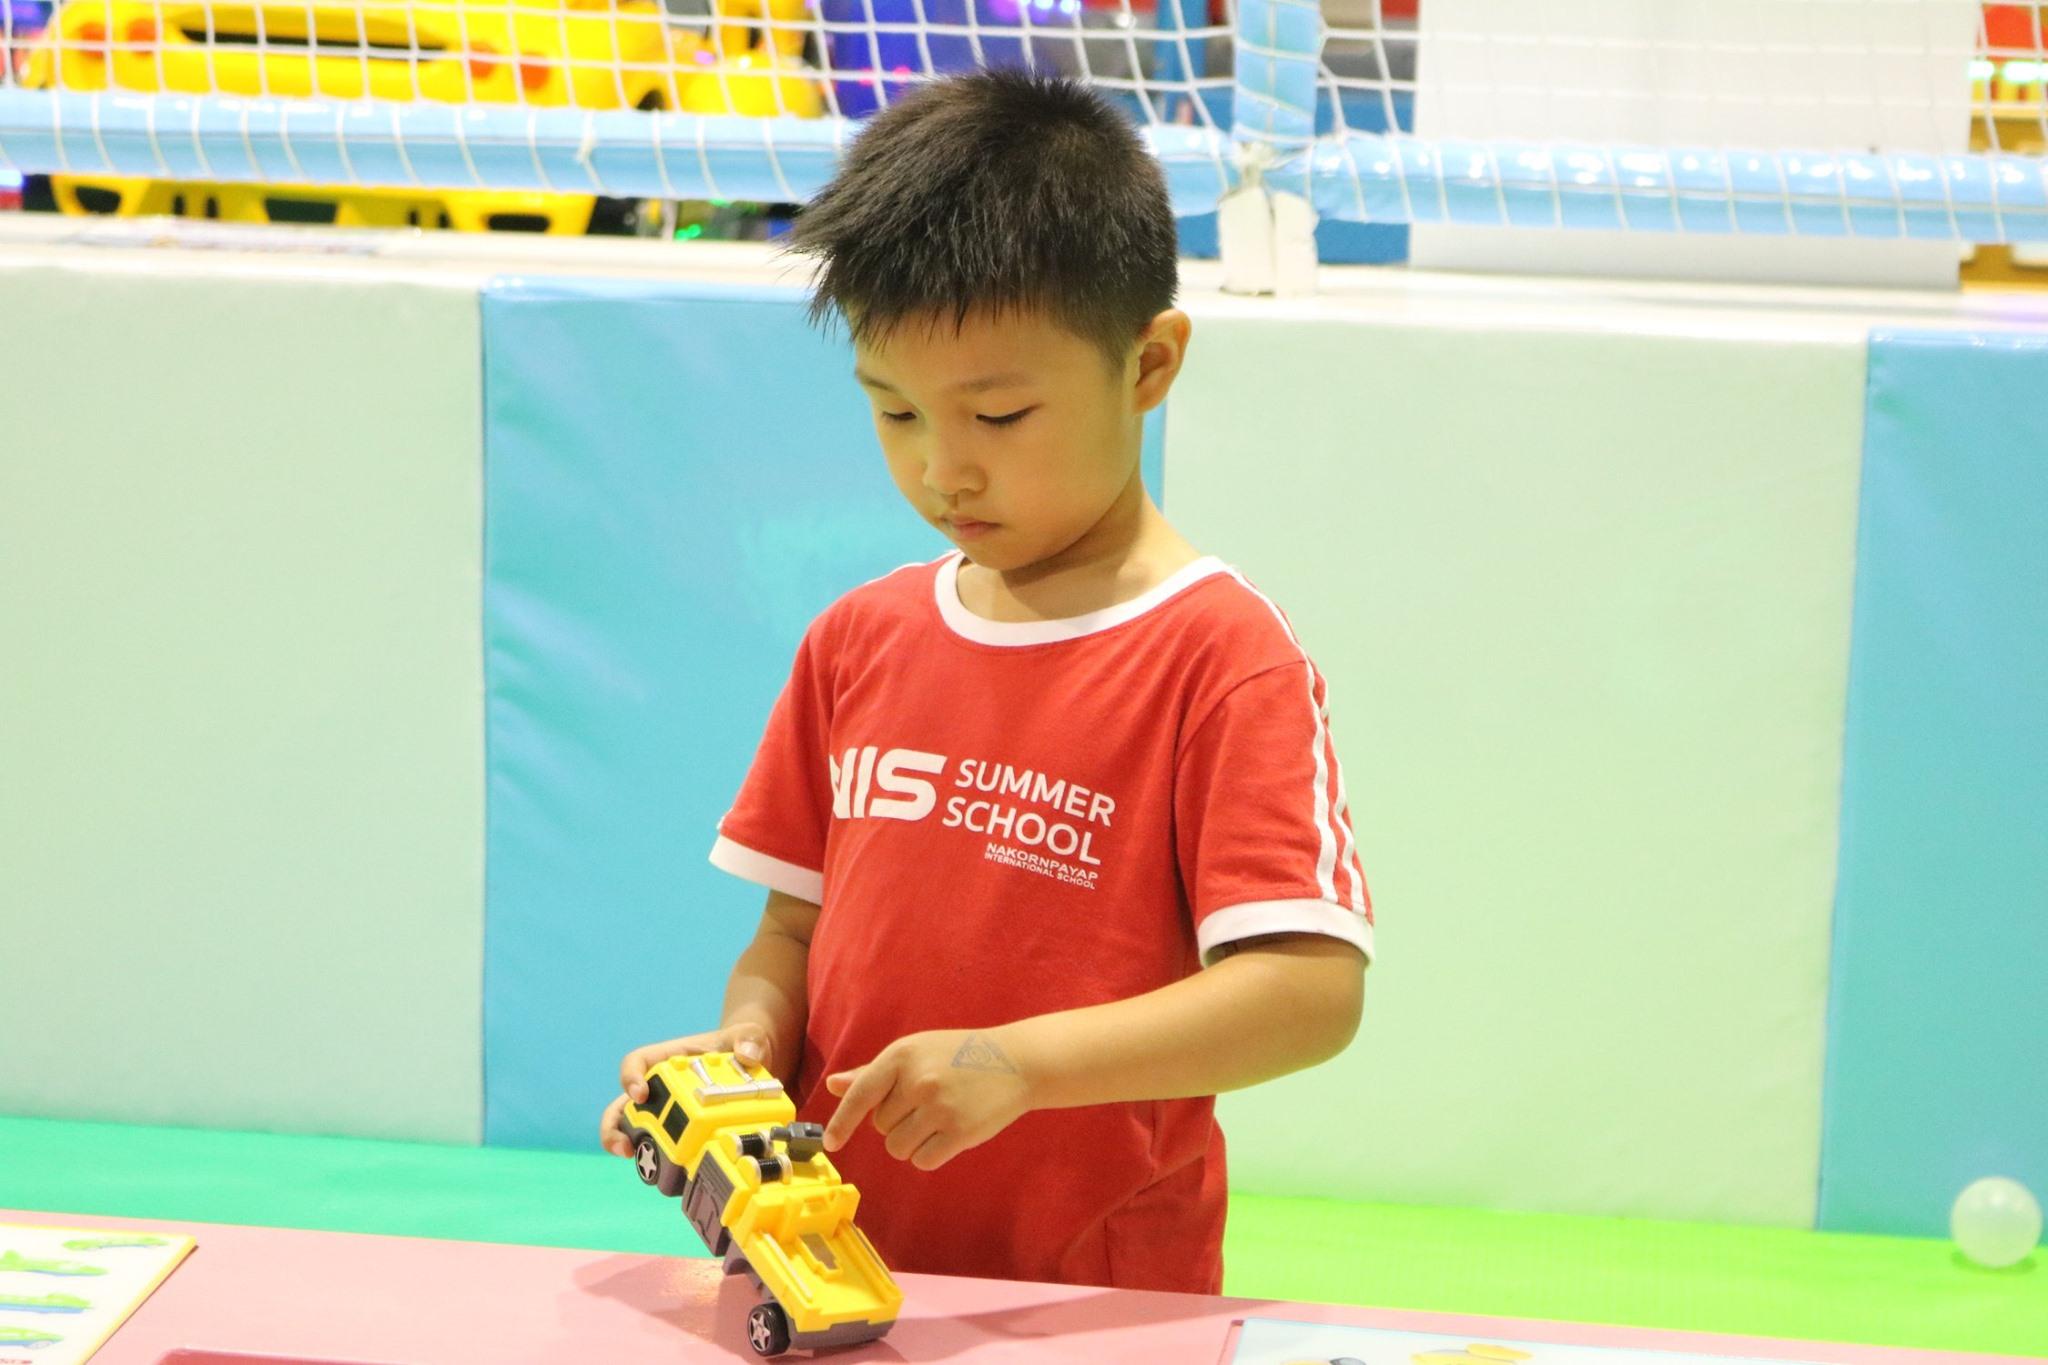 NIS-Summer-School-2019-Day-24-Kiddy-Land-124